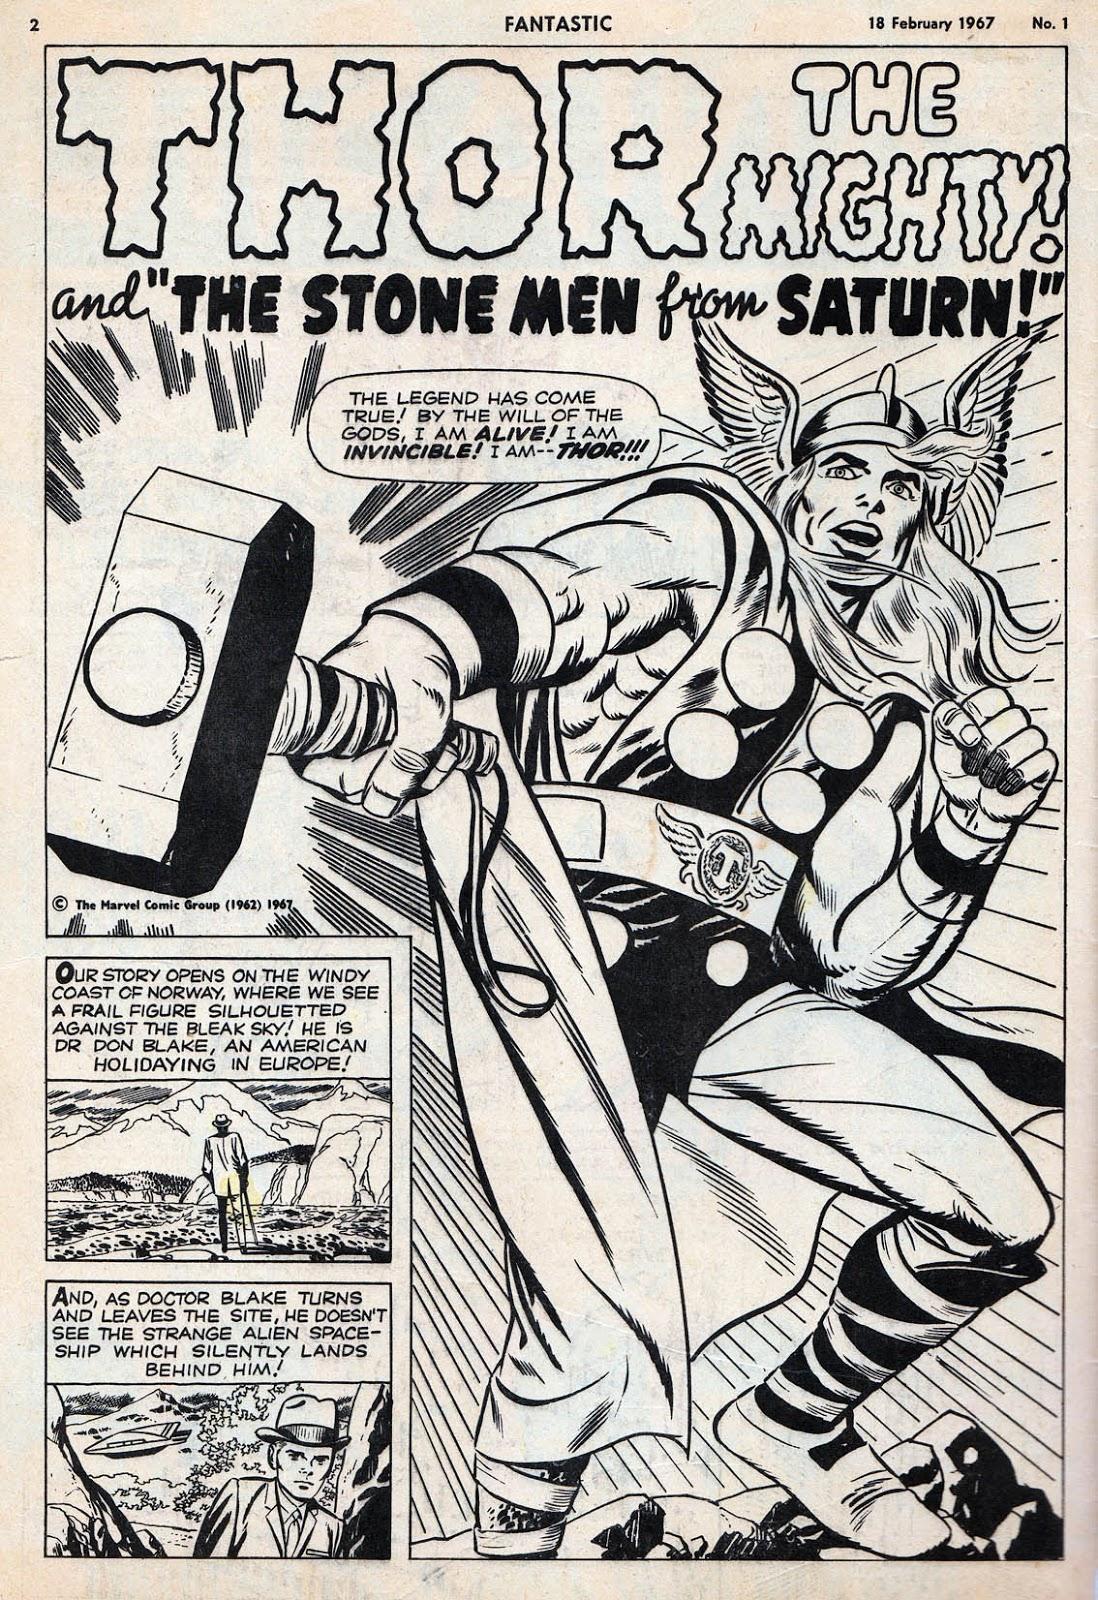 BLIMEY! The Blog of British Comics: FANTASTIC 50th!